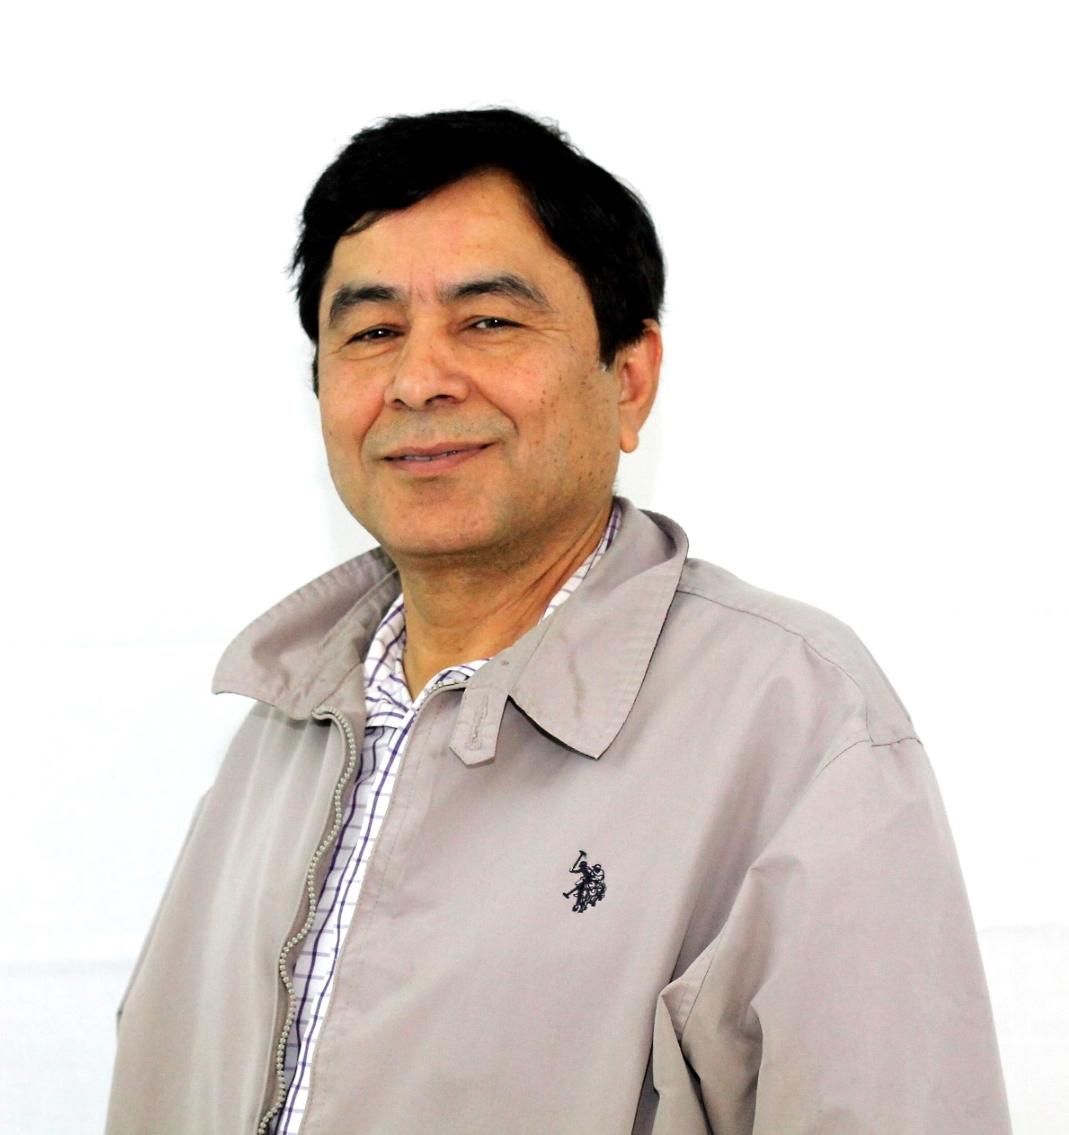 Anil Malhotra